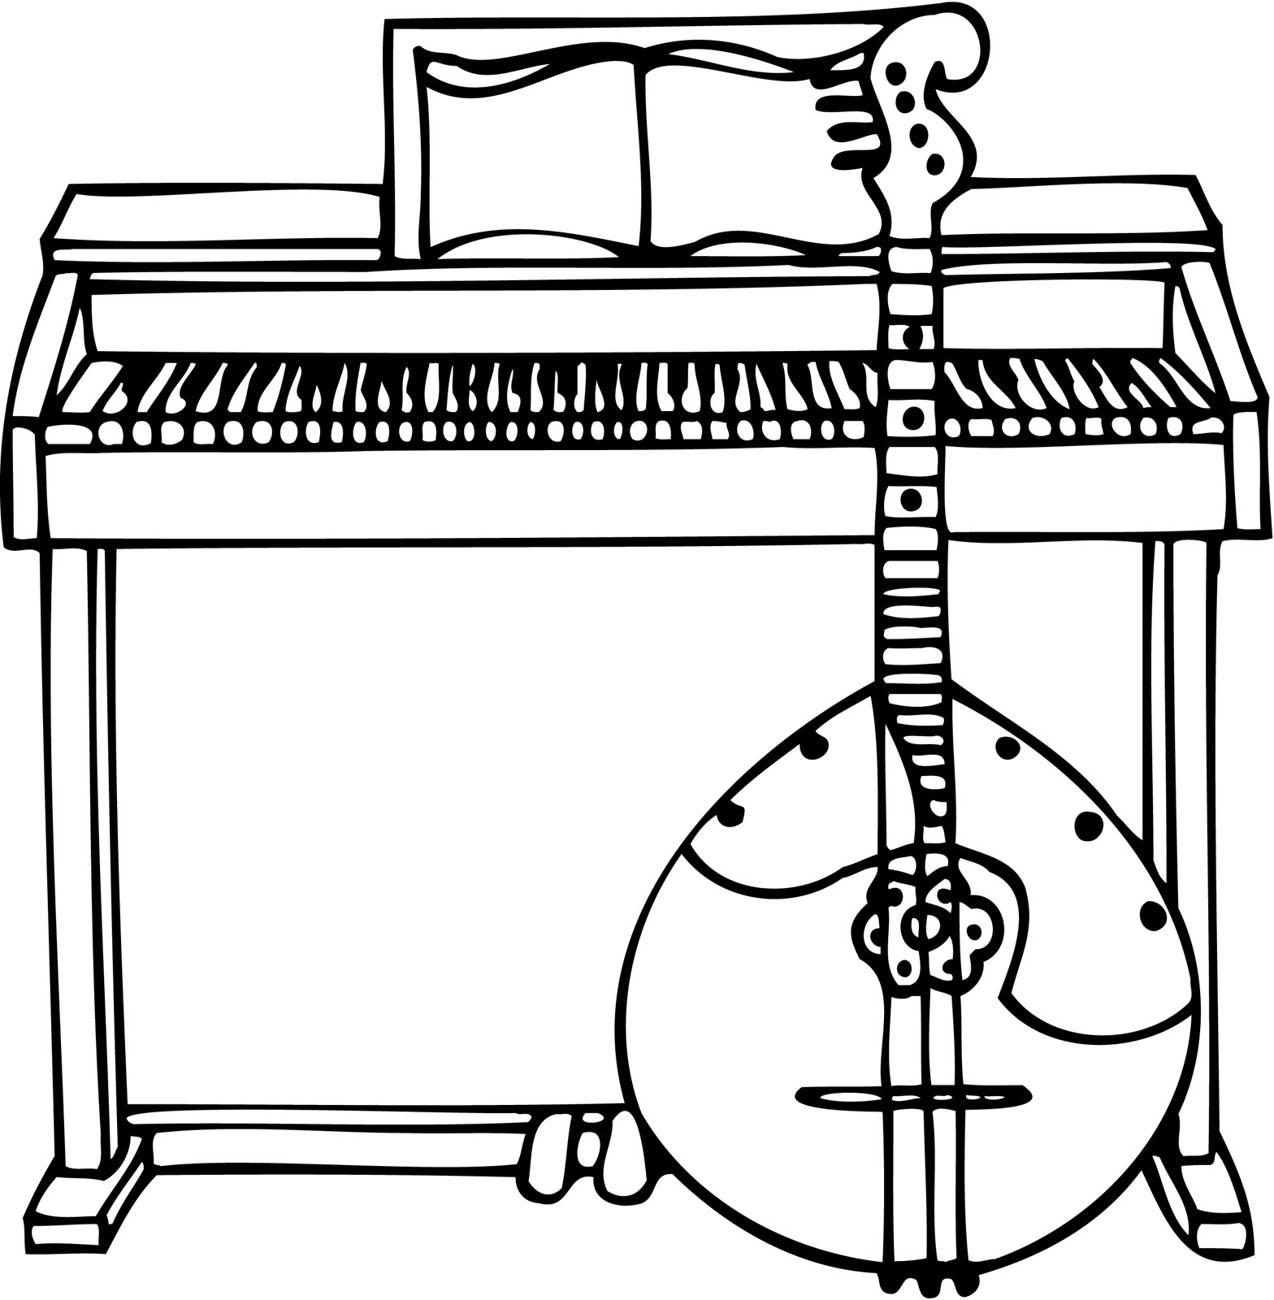 MUSIC-067